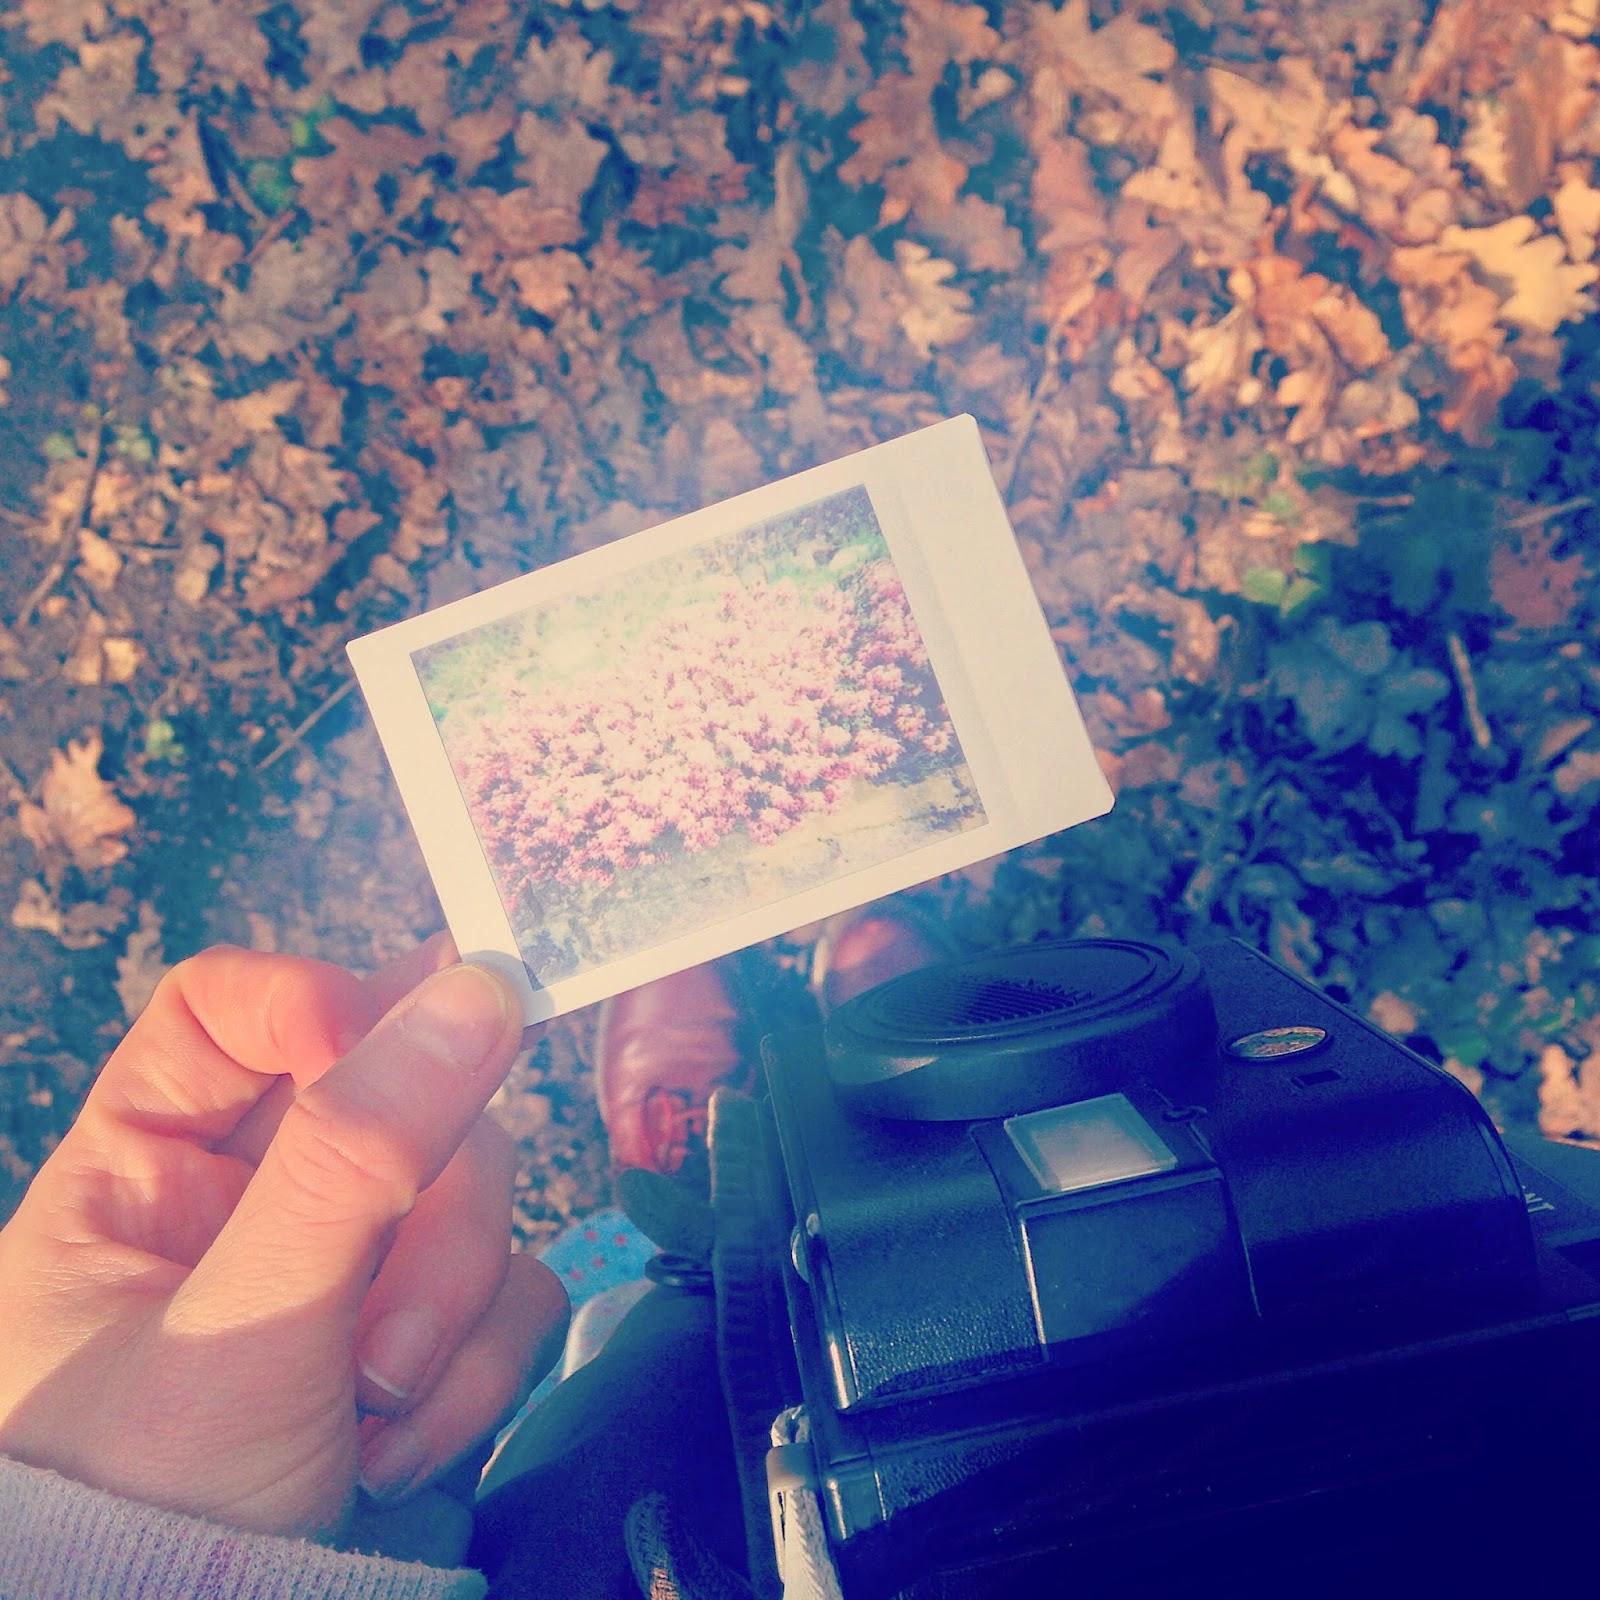 A Polaroid Image